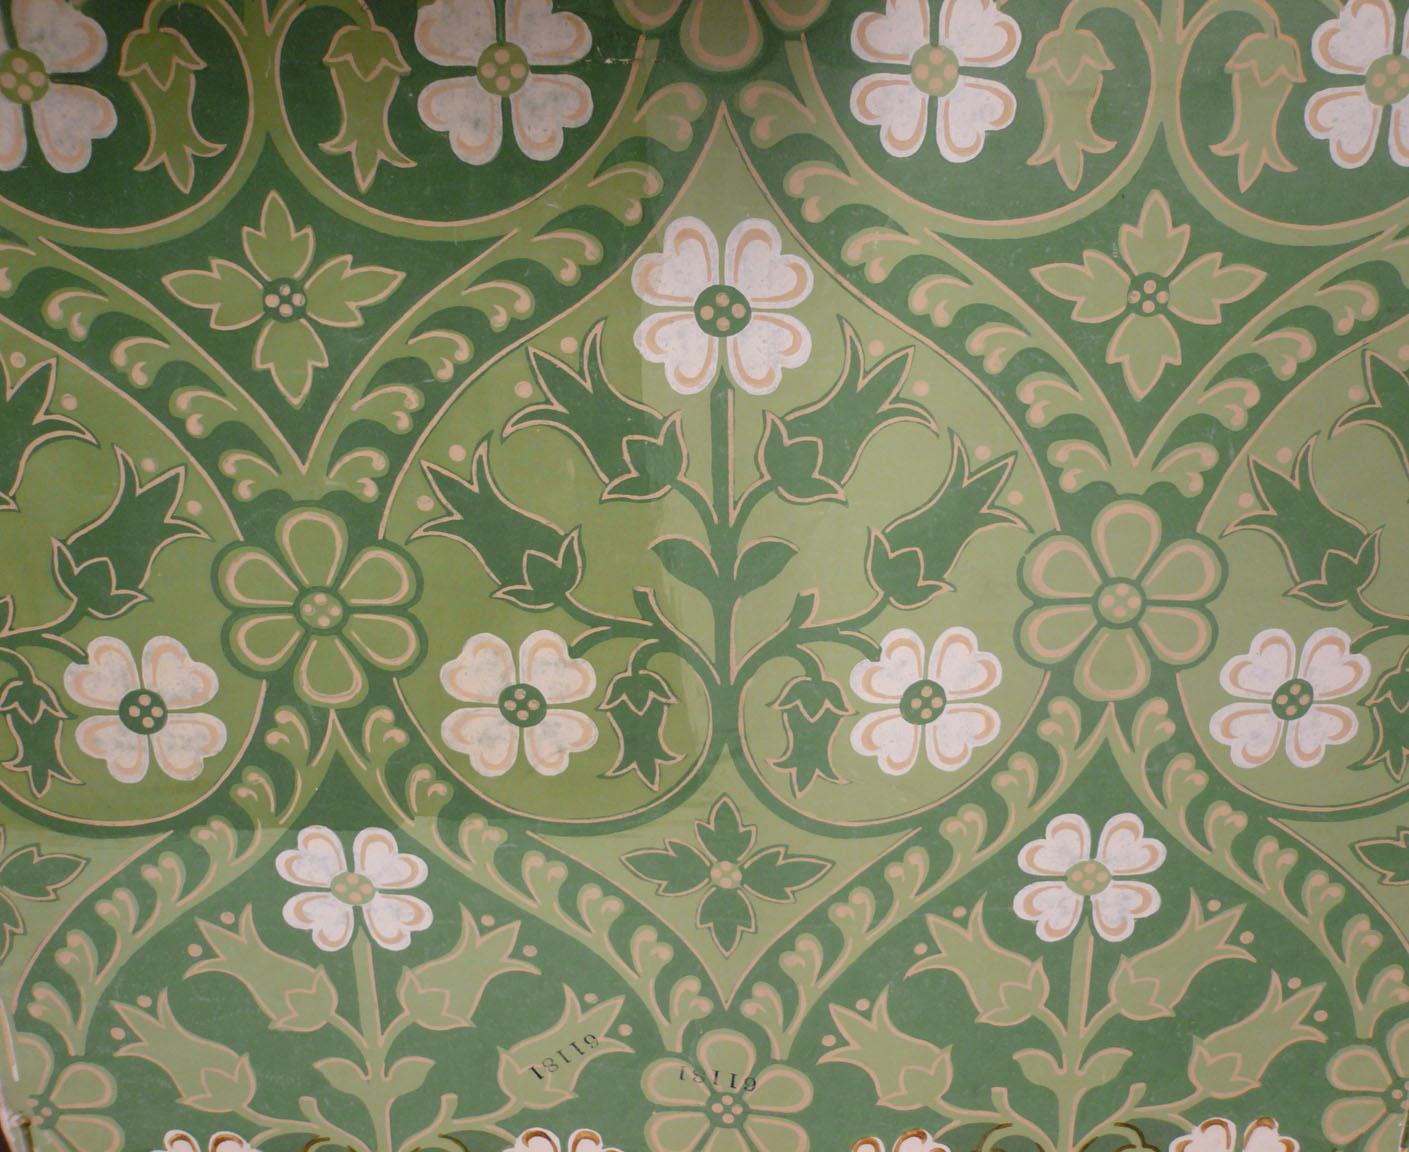 Wallpaper sample (floral) designed by A W N Pugin